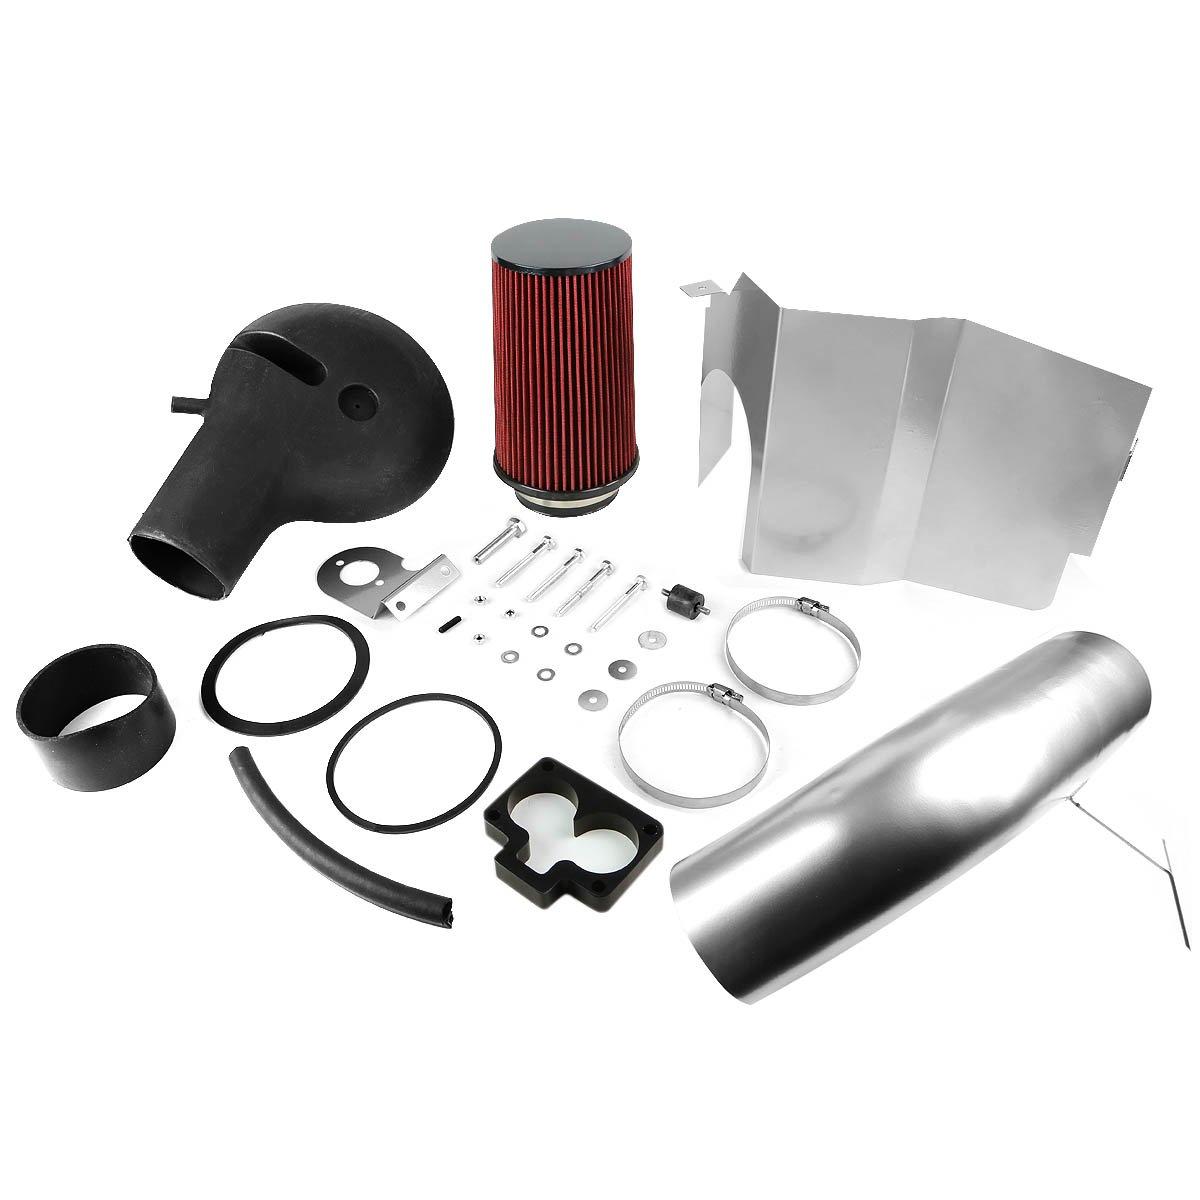 For 97-99 Dodge Dakota Durango V8 DNA Motoring AIP-2-HS-DAKOTA97V8-SLSL Cold Air Intake System w//Heat Shield